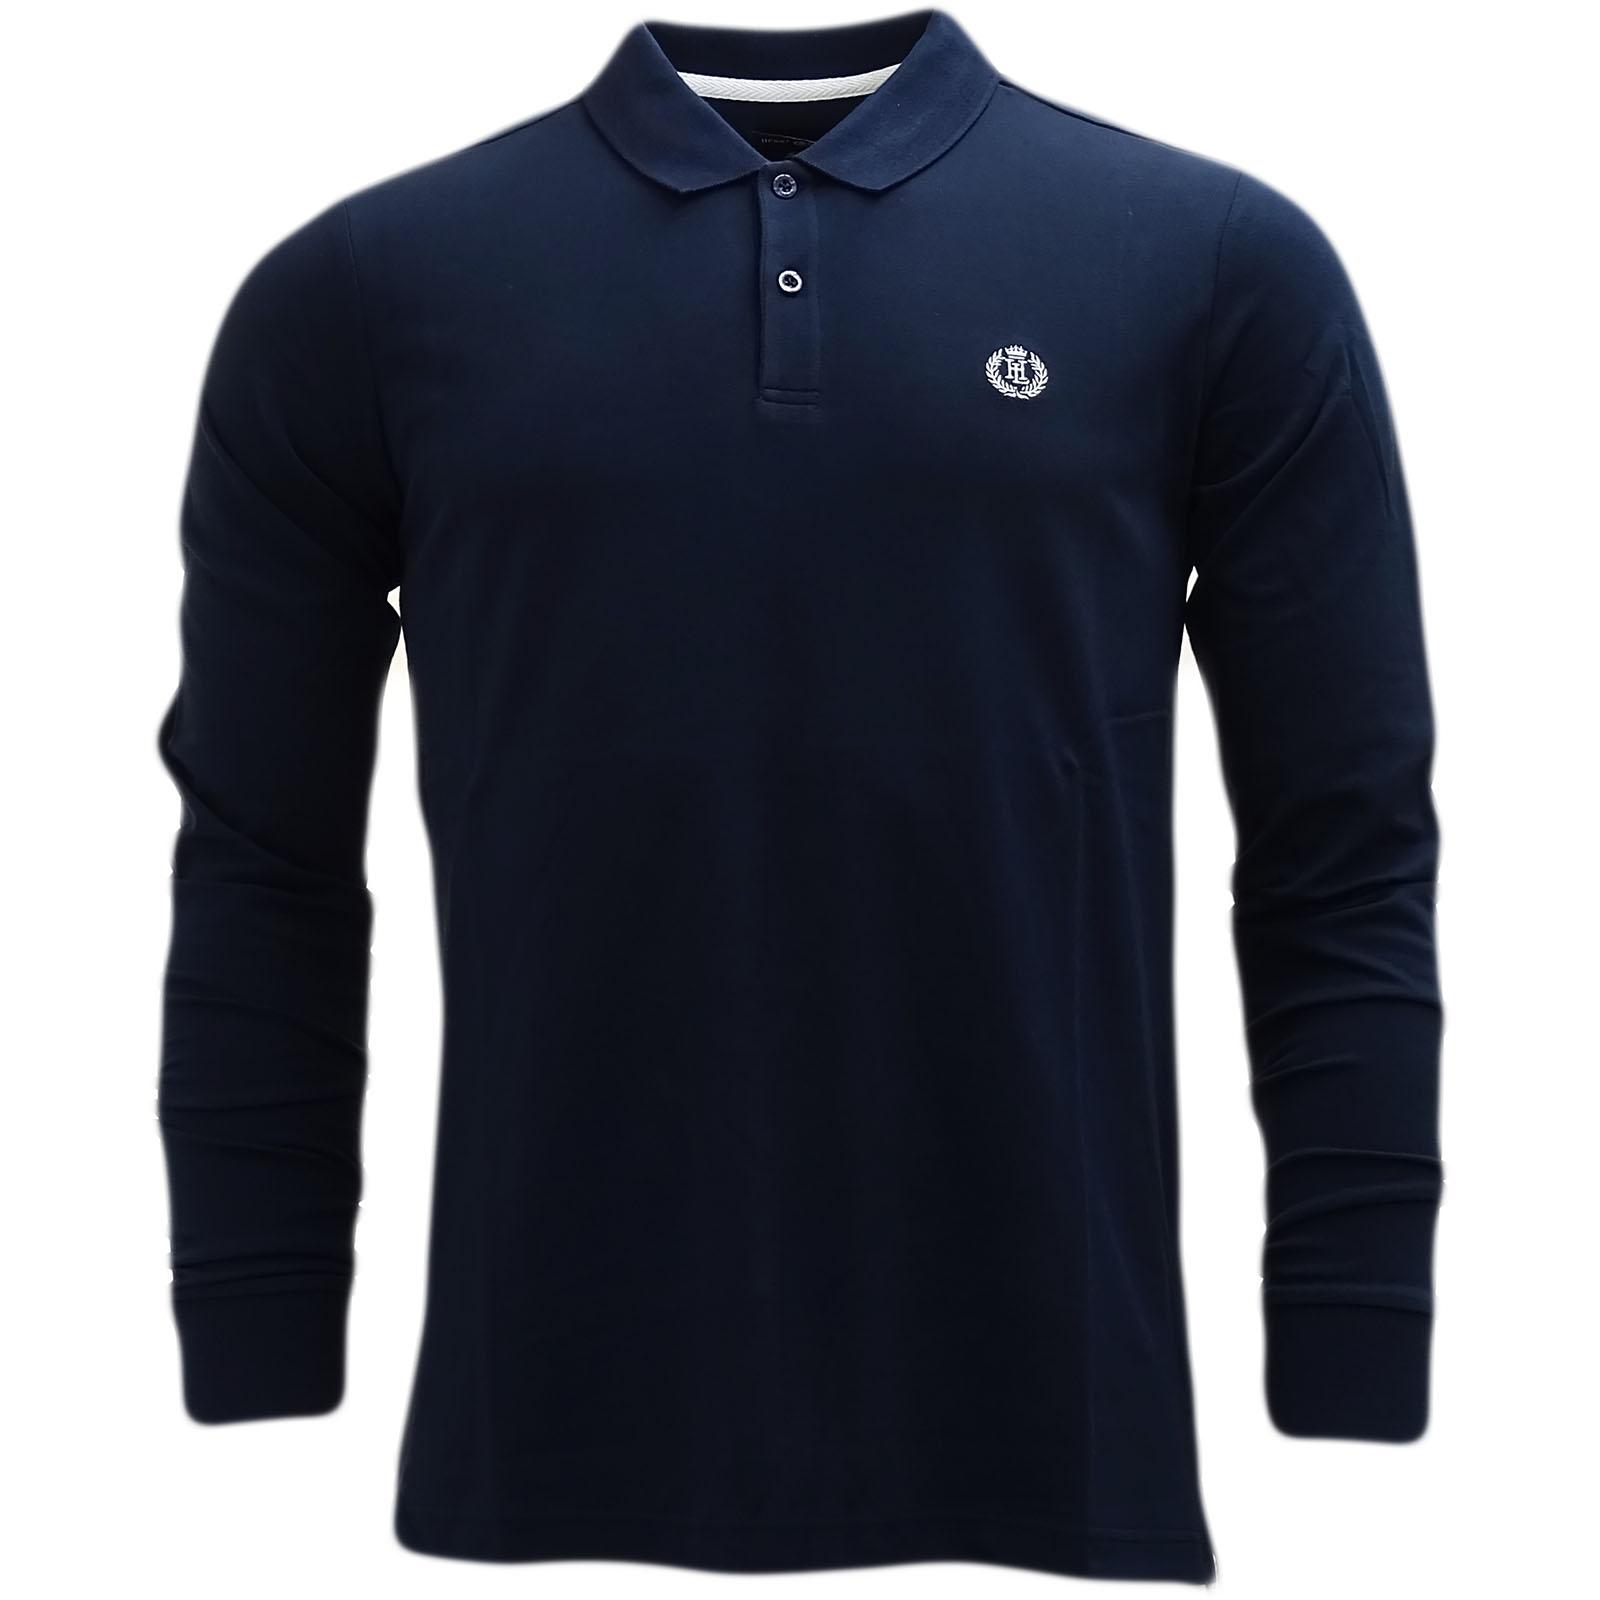 1b56212cf74 Mens Long Sleeve Polo Shirts by Henri Lloyd (Musburry) | eBay